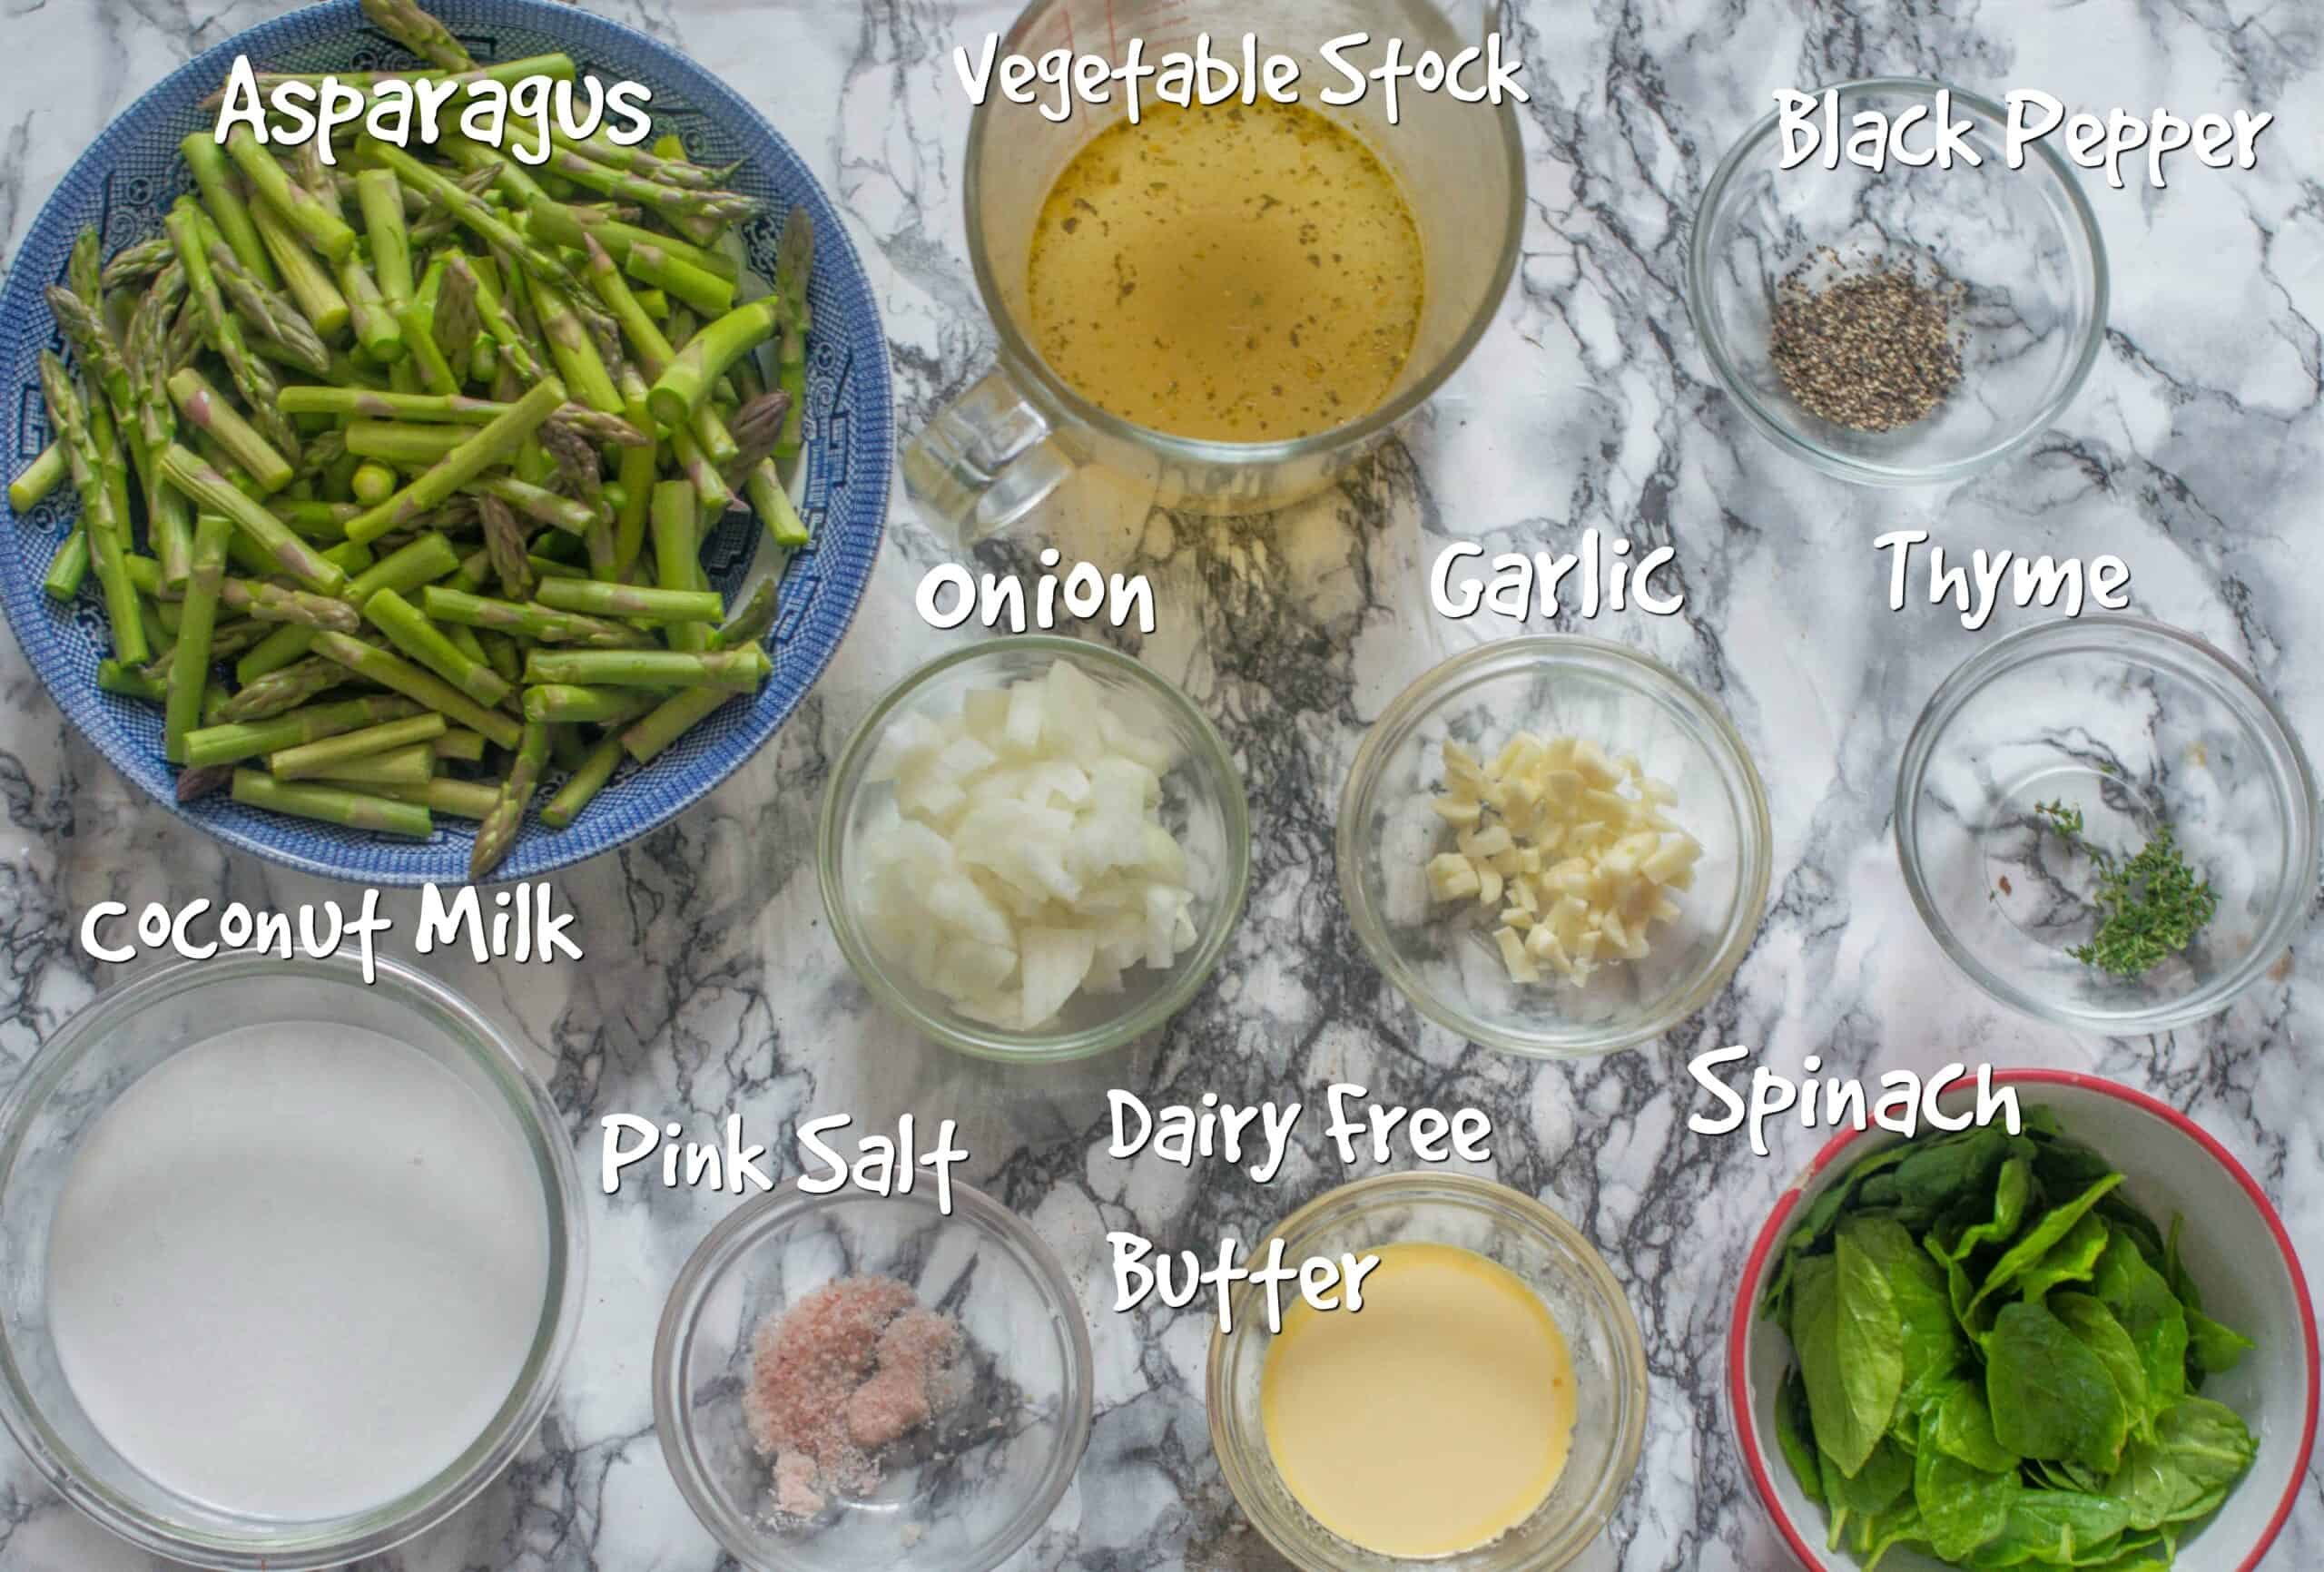 ingredients for instant pot asparagus soup